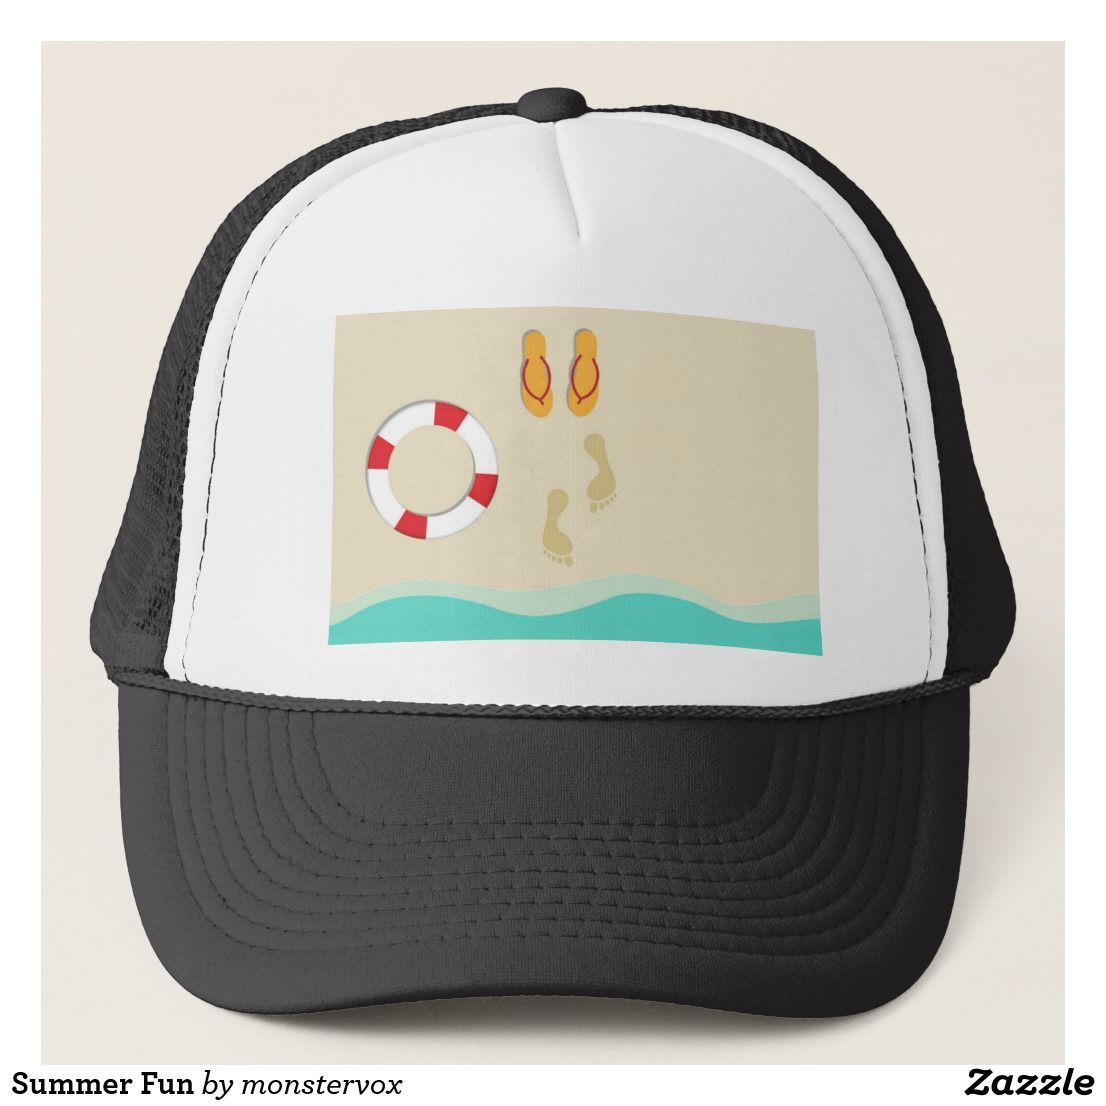 bd4c73c2 Yoga Trucker Hat | Zazzle.com | My Zazzle Products at  zazzle.com/monstervox* | Hats, Yoga, Cap